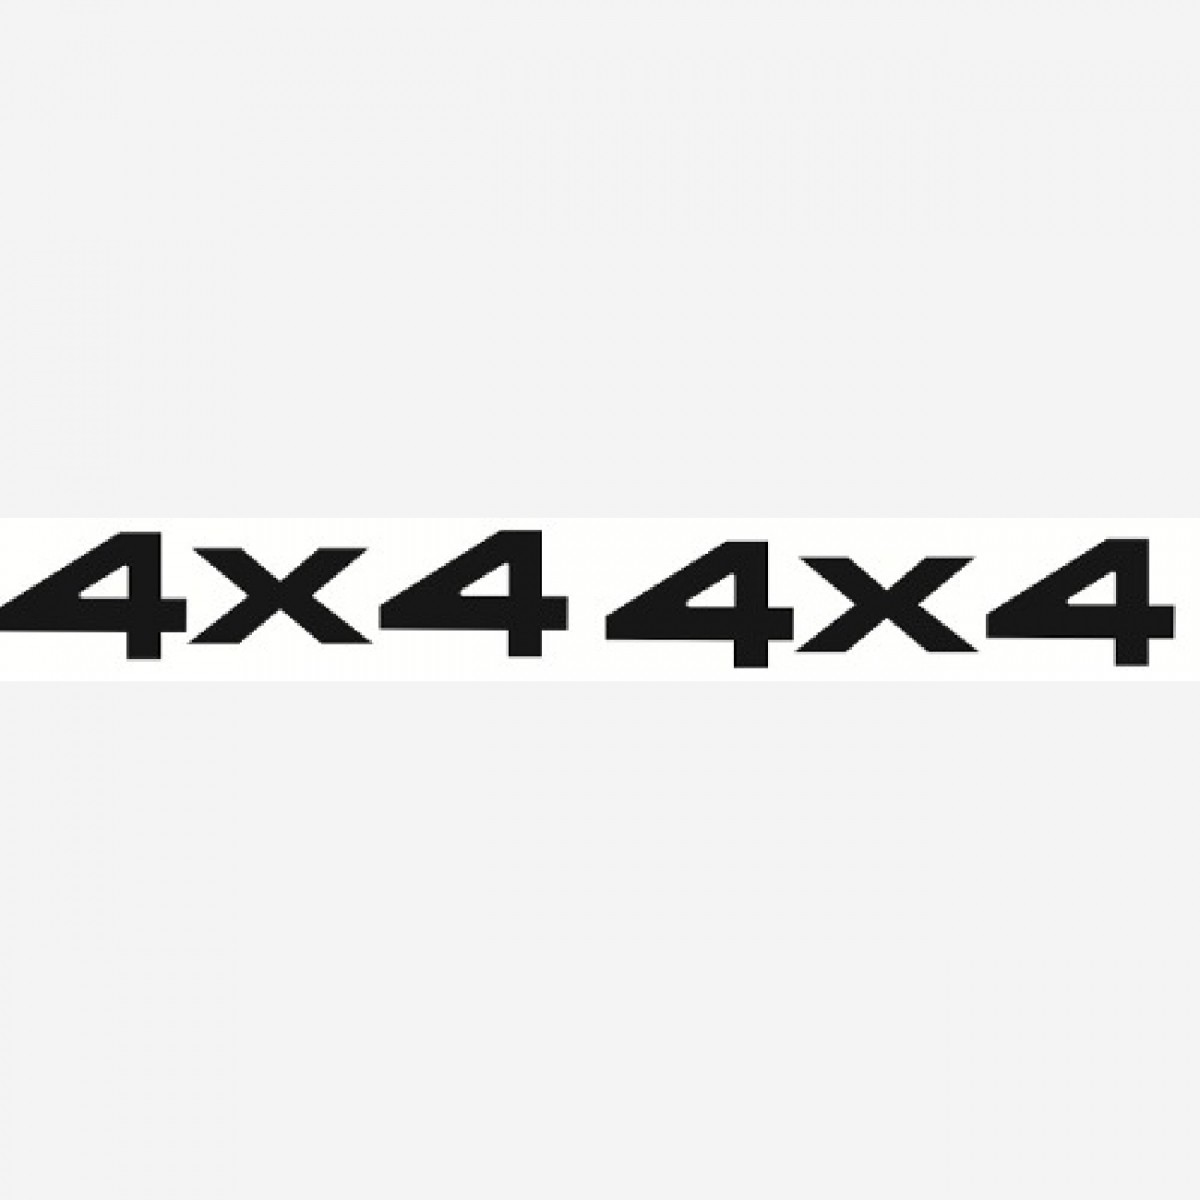 Par Adesivo 4x4 Cherokee Sport Decalx